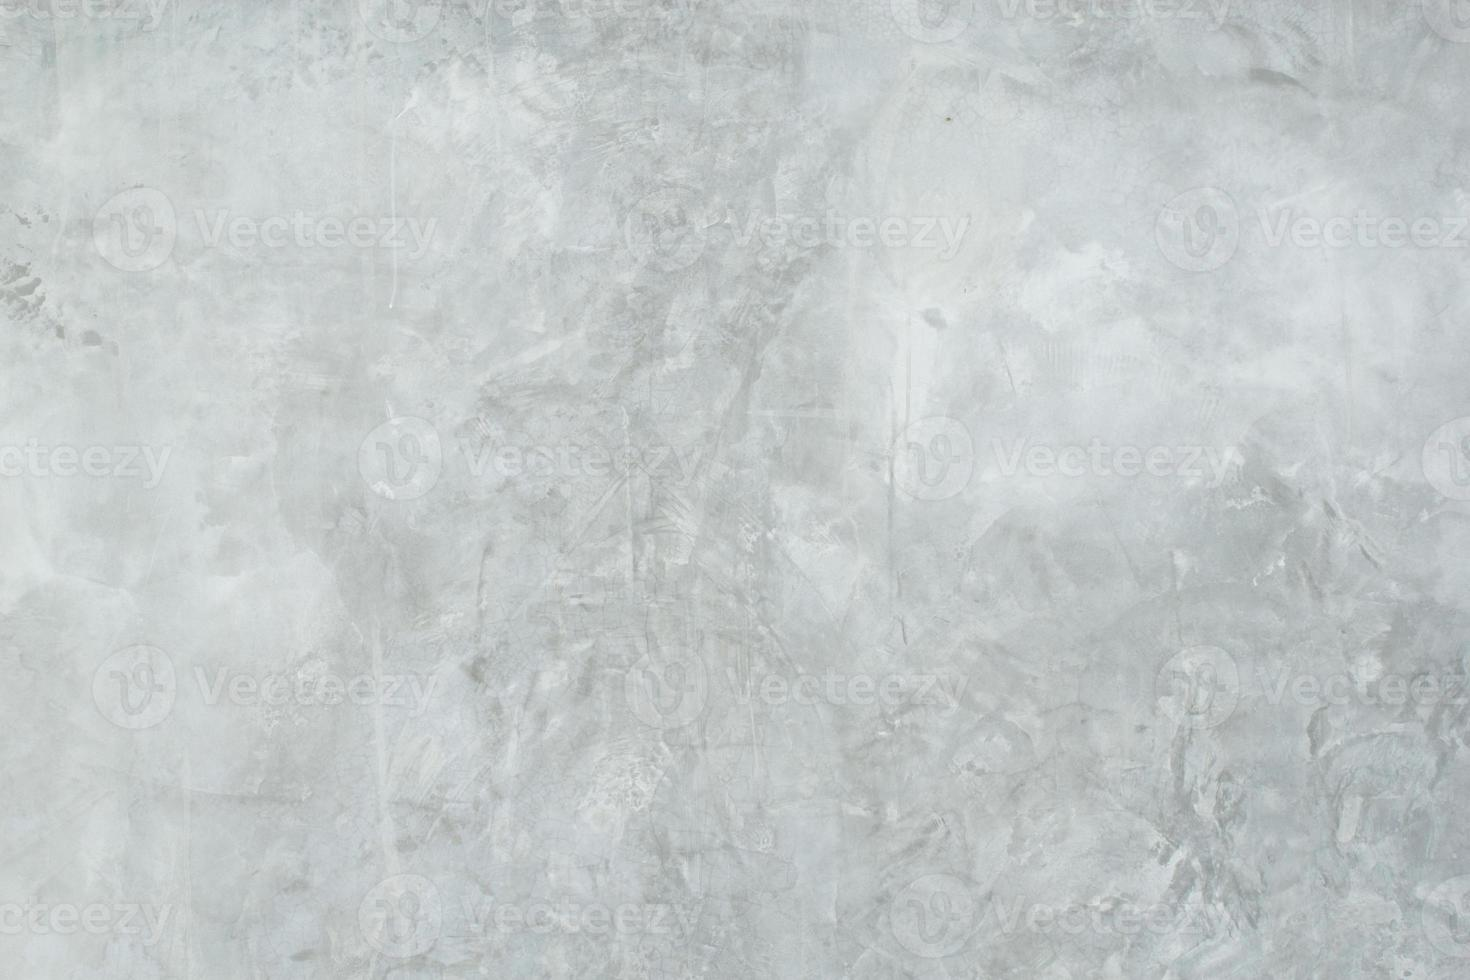 parede de concreto - plano de fundo texturizado foto